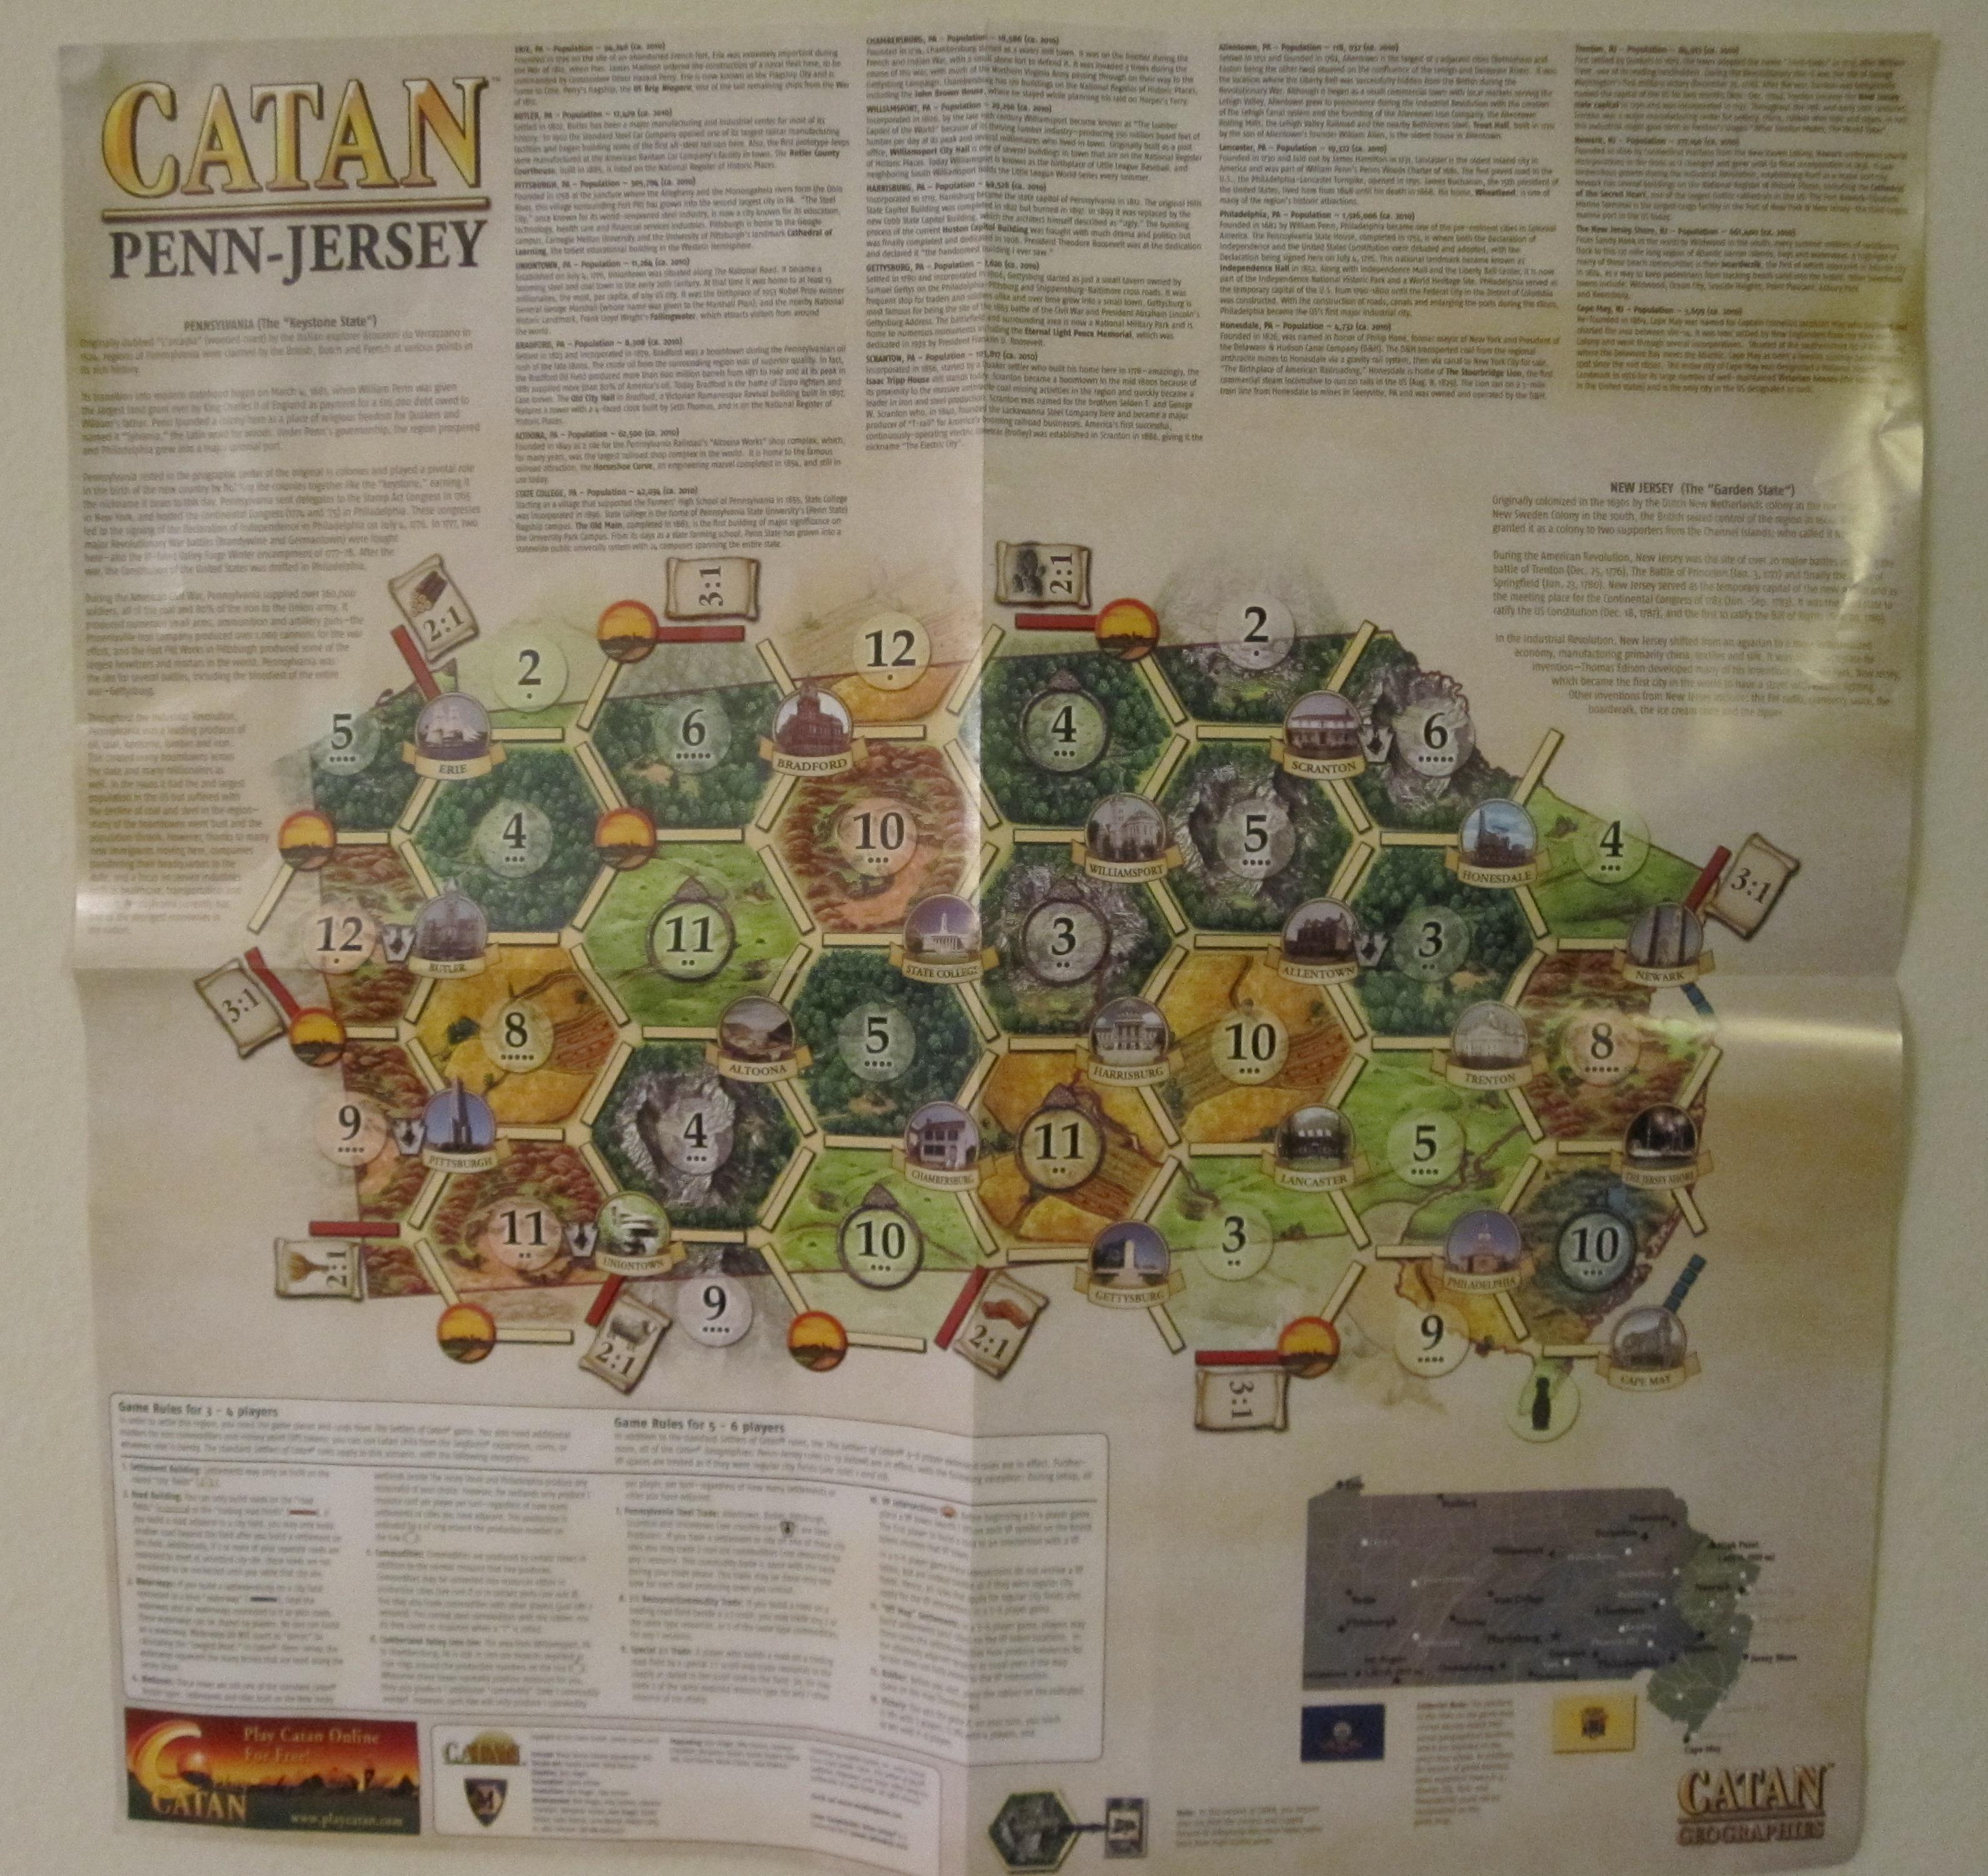 Catan Geographies: Penn-Jersey